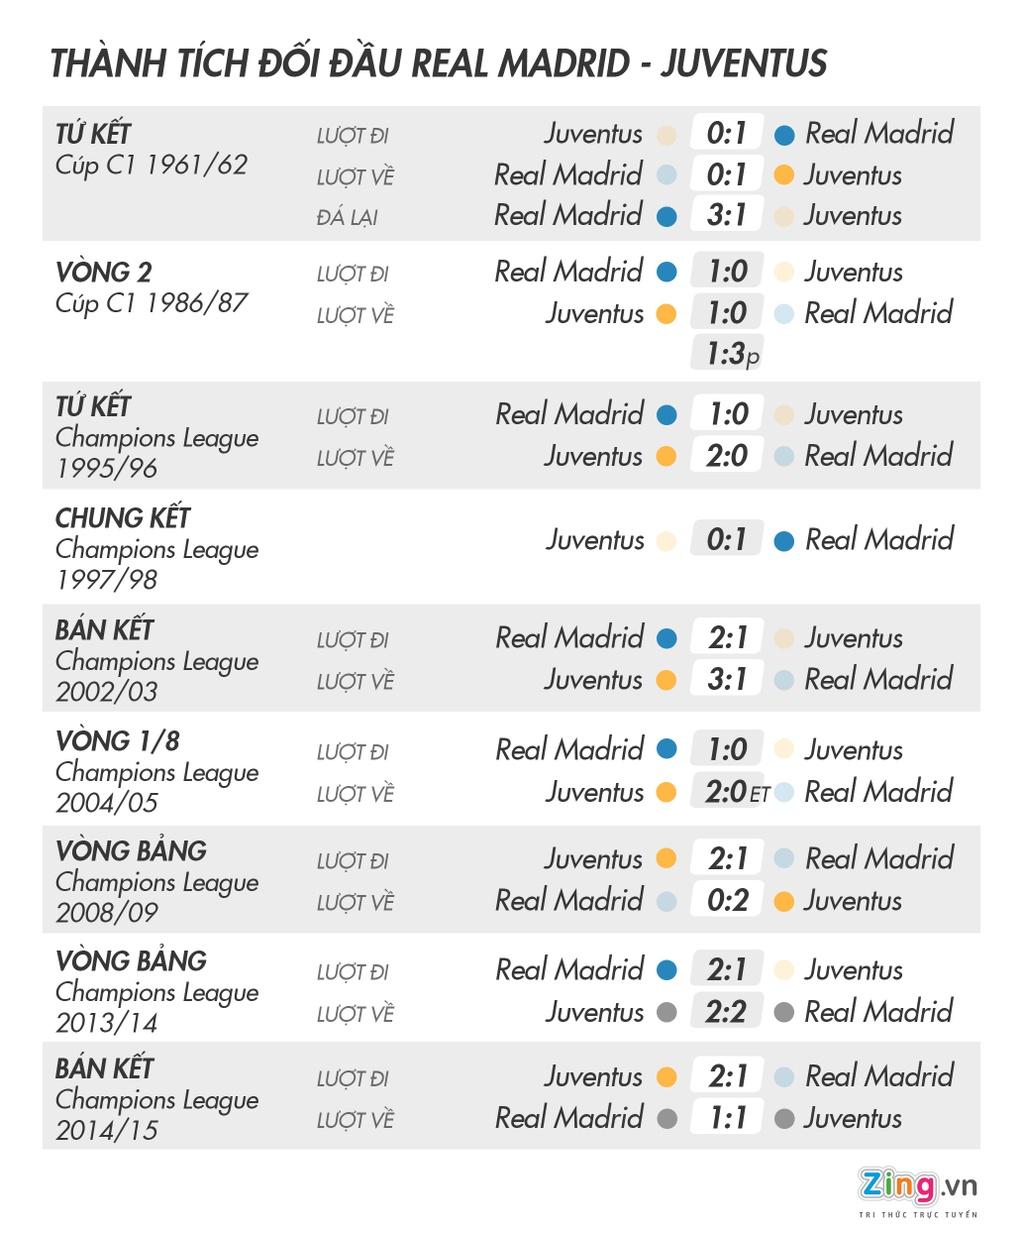 Real Madrid vs Juventus: Lich su, loi nguyen 25 nam va su den dui hinh anh 1